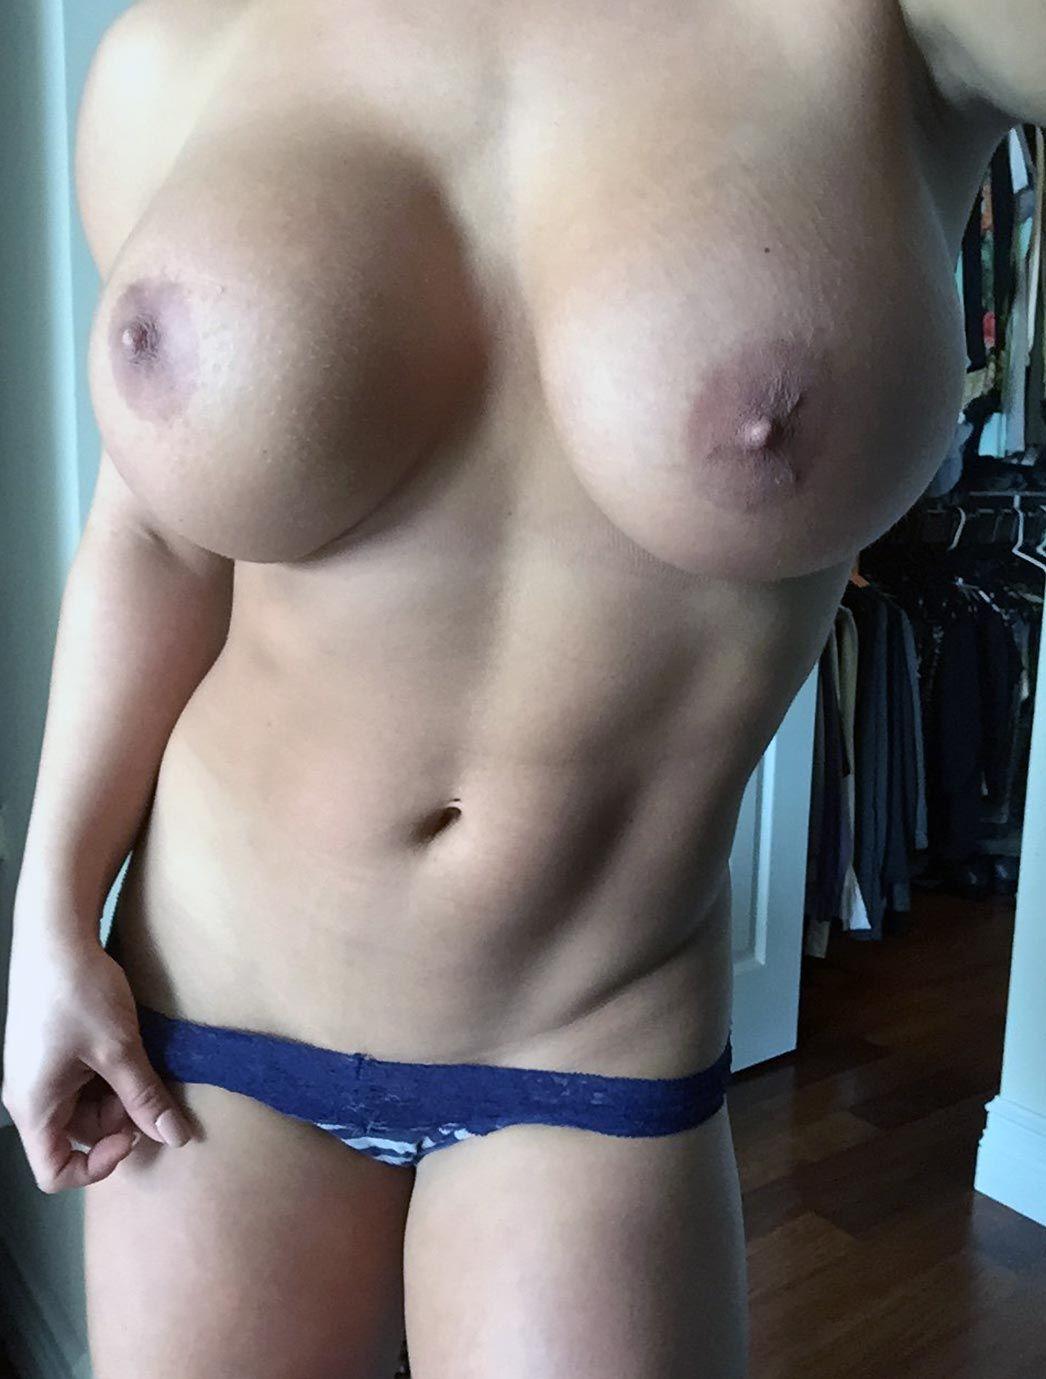 Celeste Bonin Nude Leaked The Fappening & Sexy 0207